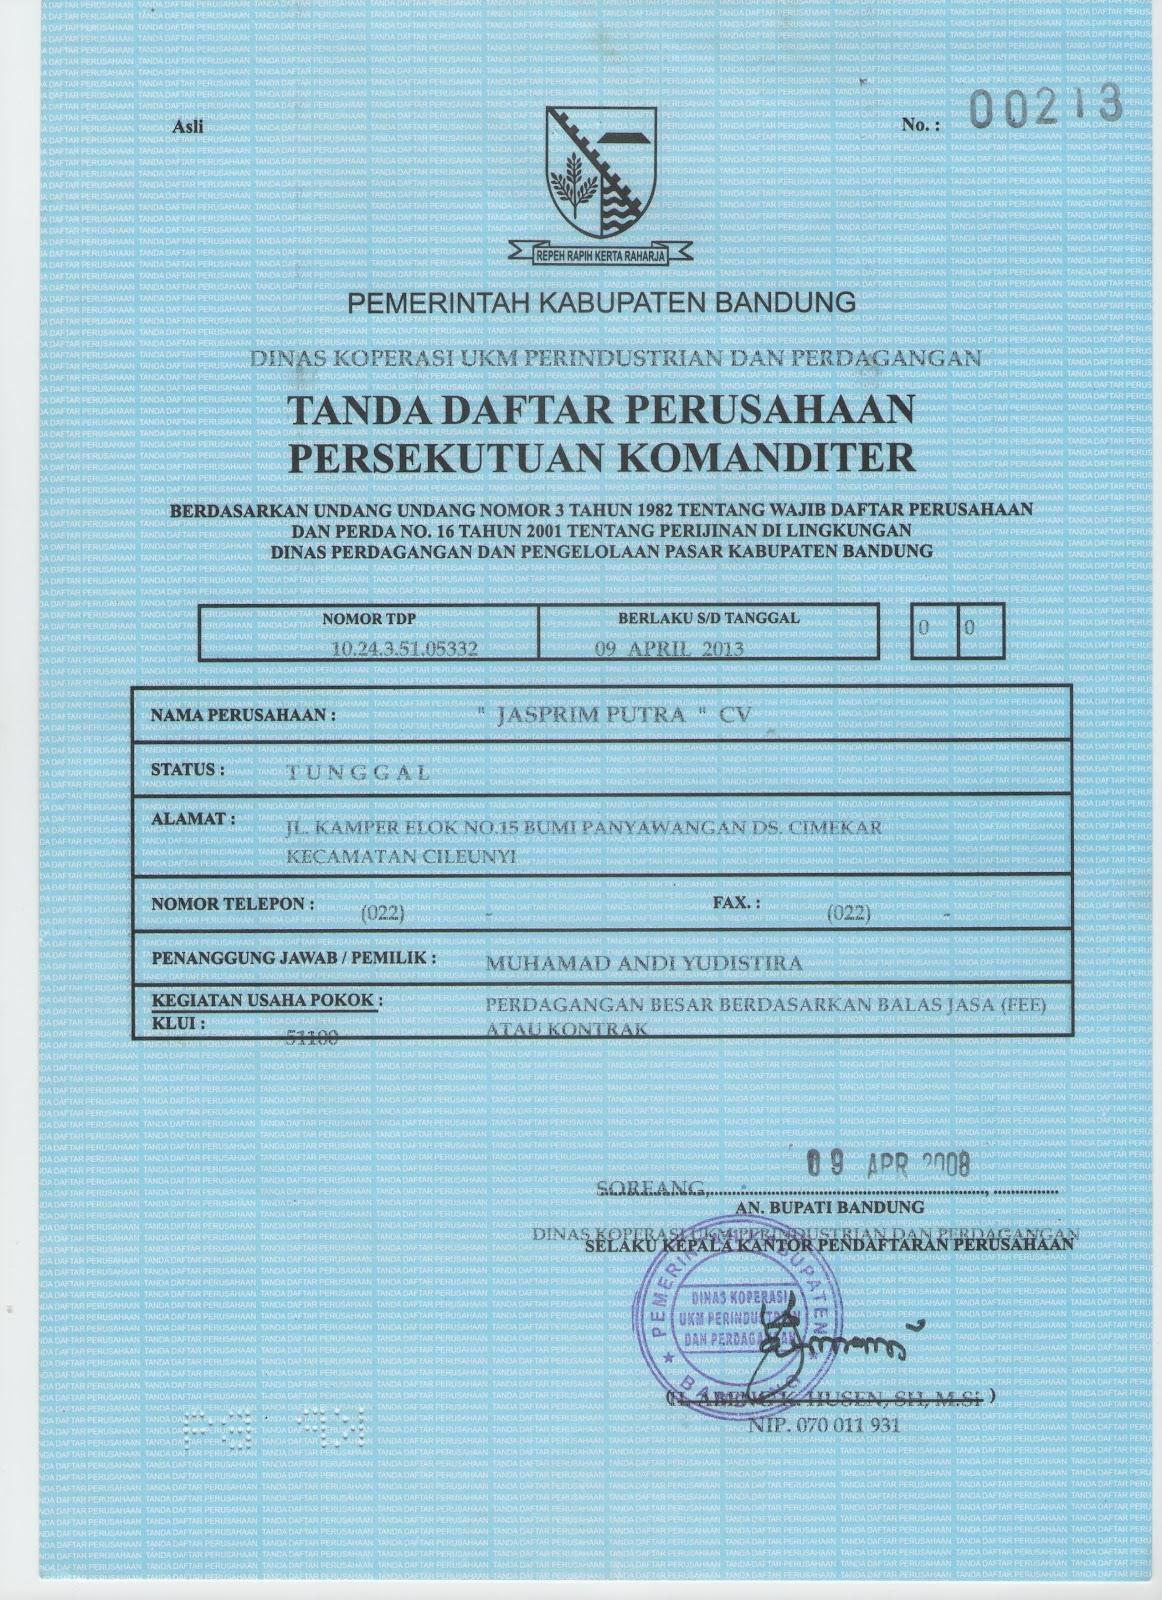 Diposkan 5th September 2012 oleh Ridwan Rianto